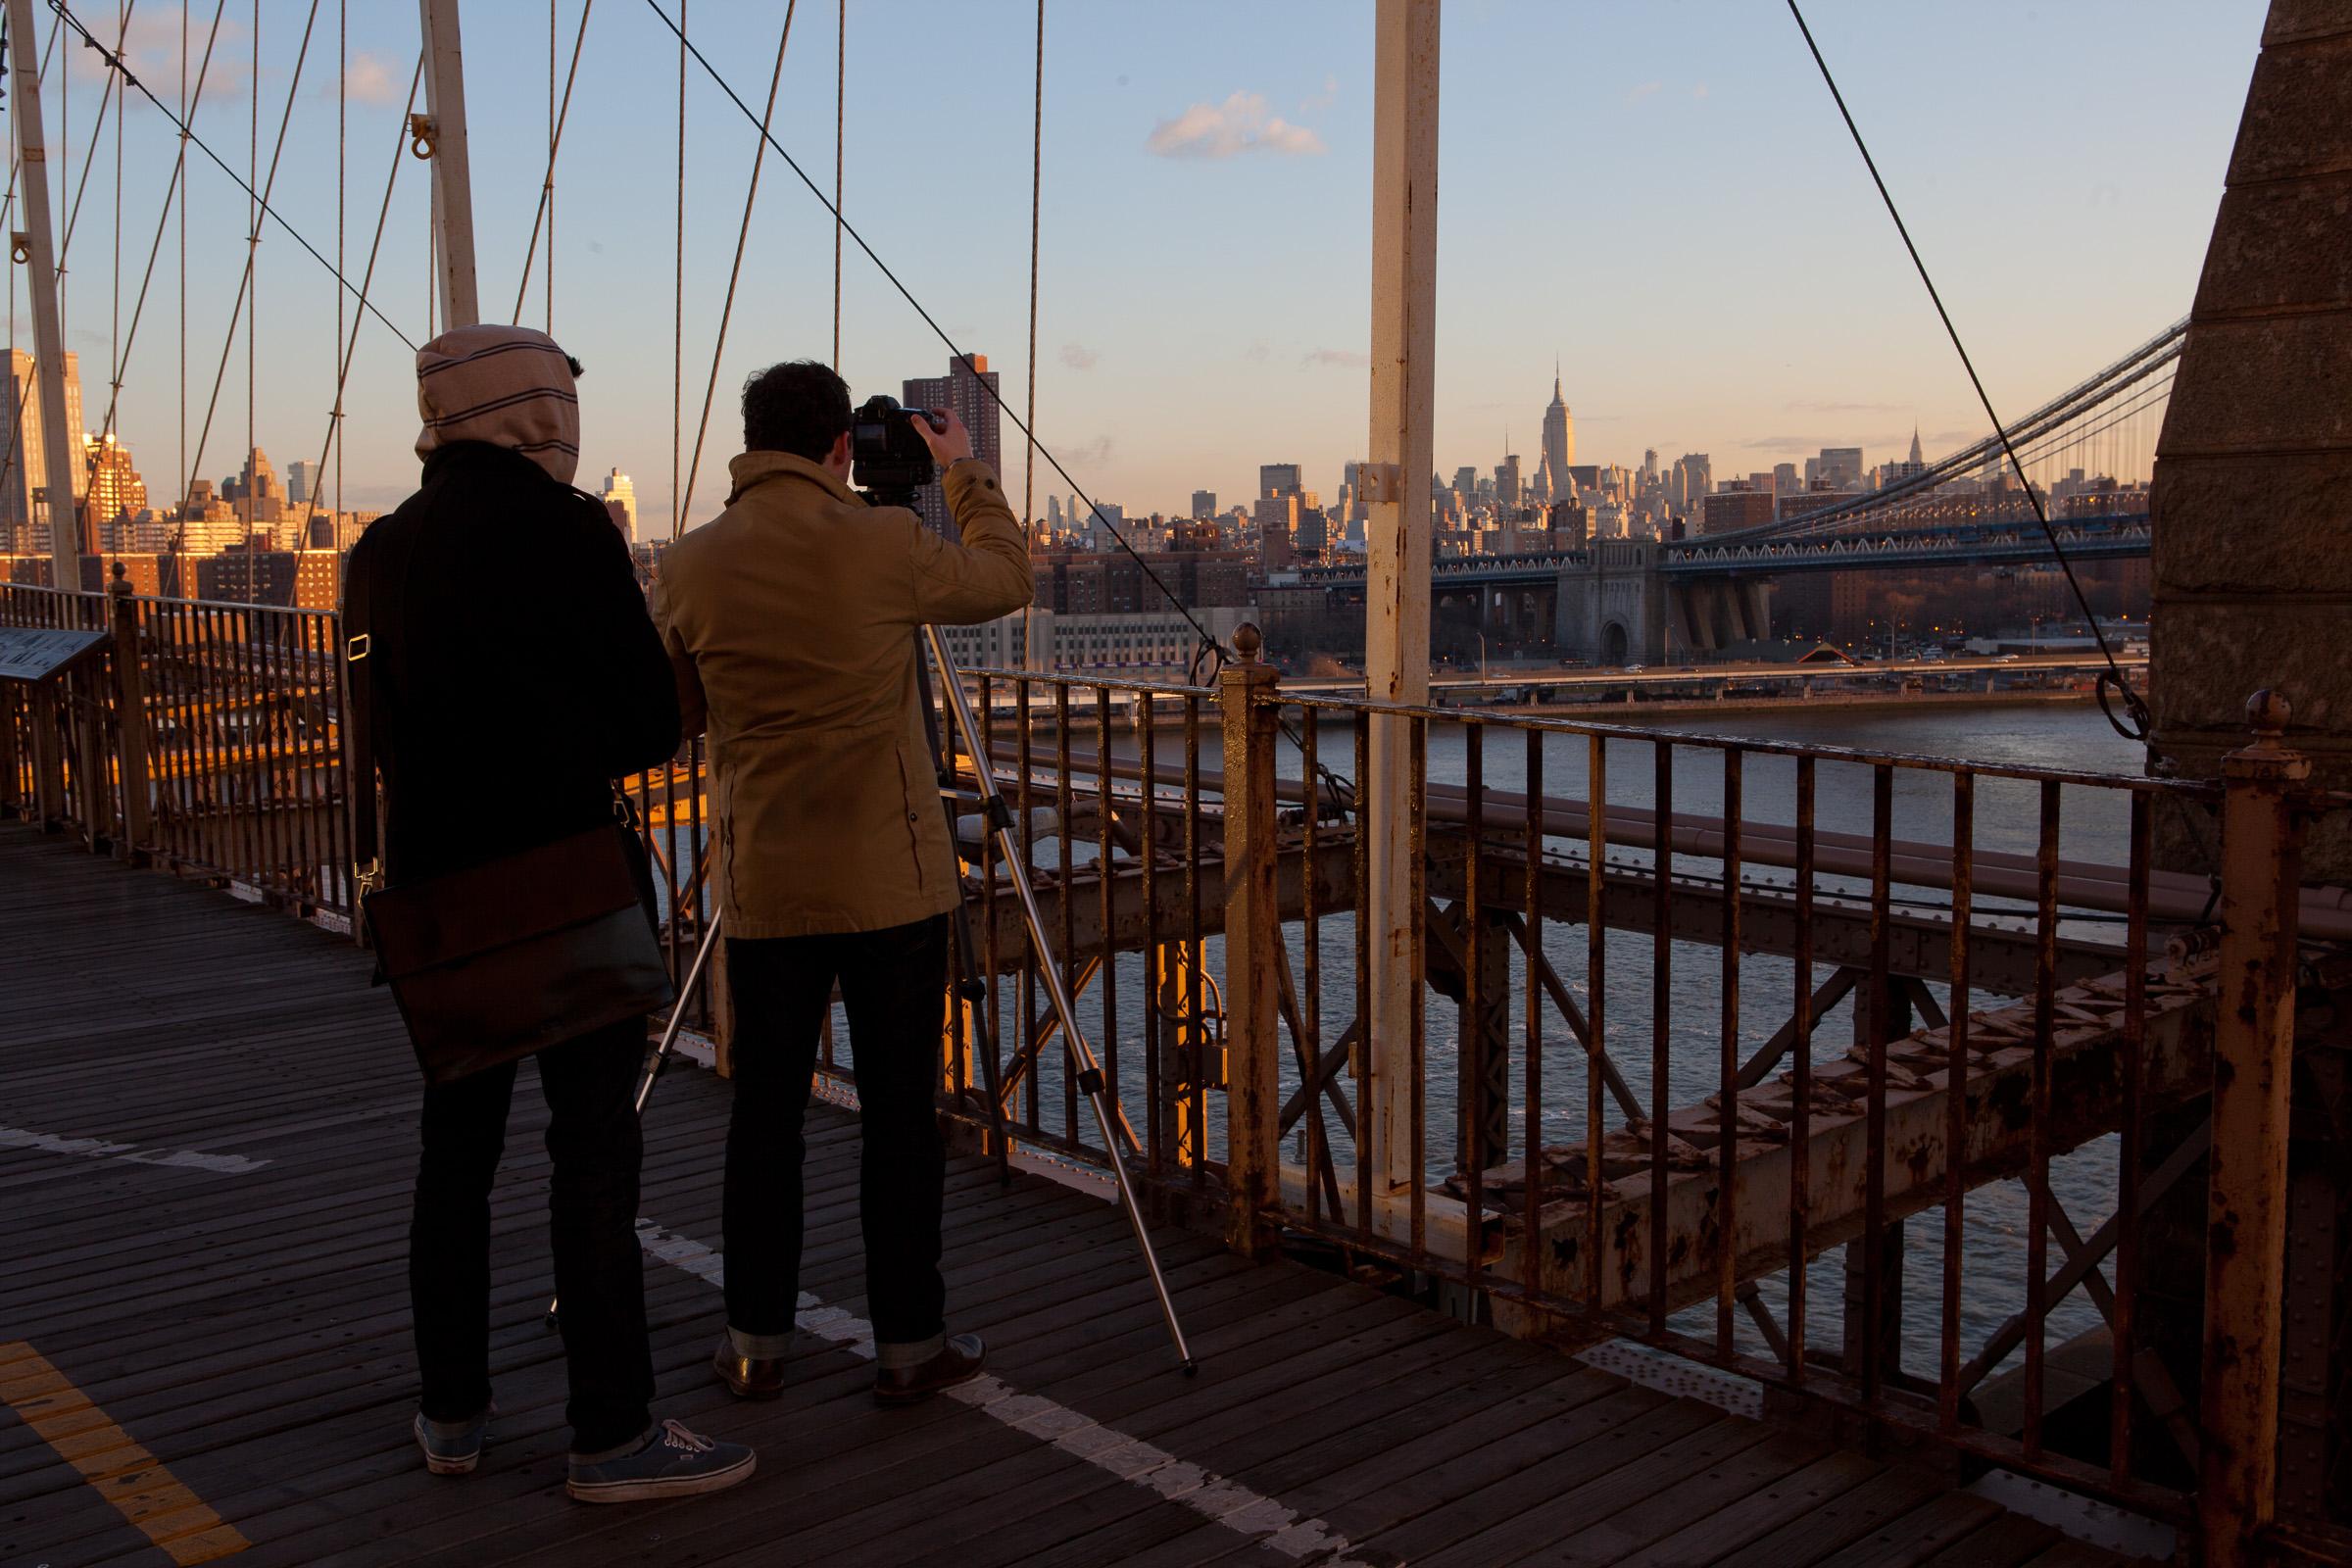 Two men shoot the sunrise from Brooklyn Bridge, NYC